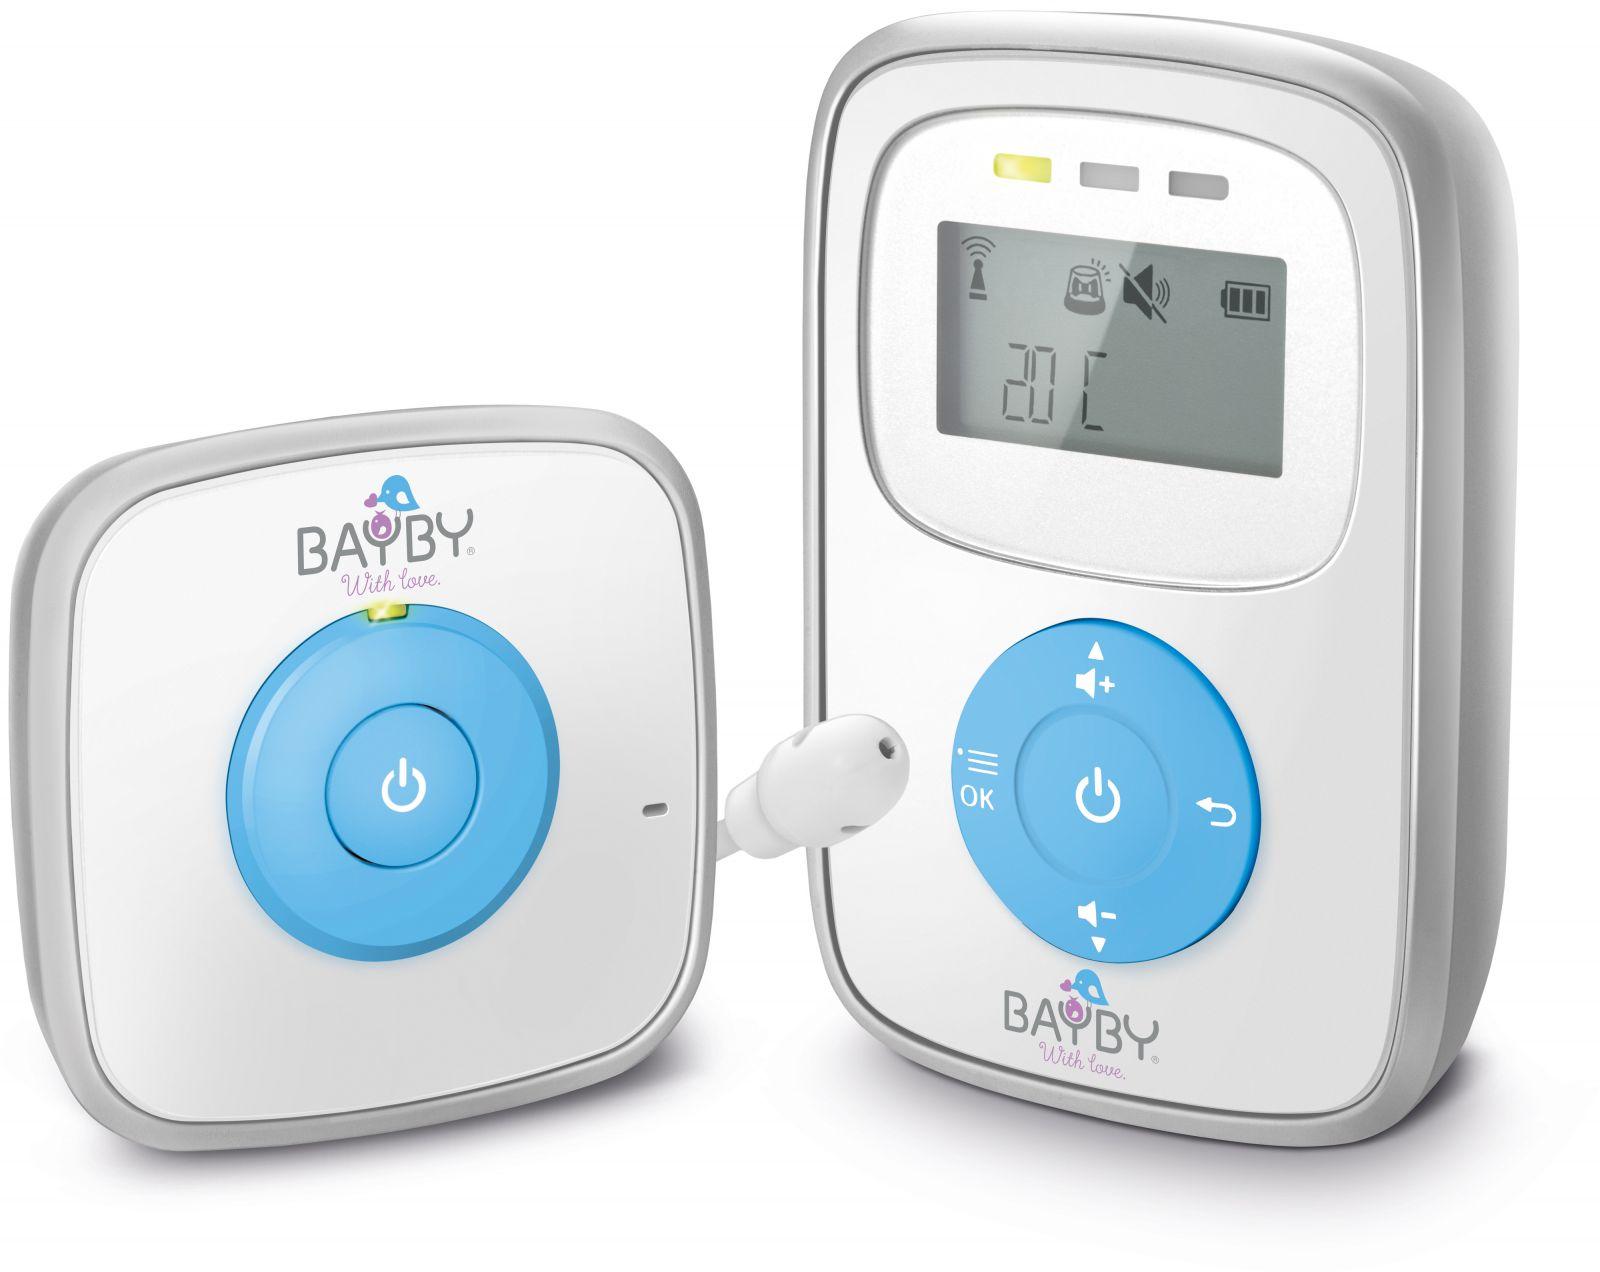 BBM 7010 Digital audio s LCD chůva BAYBY Sencor